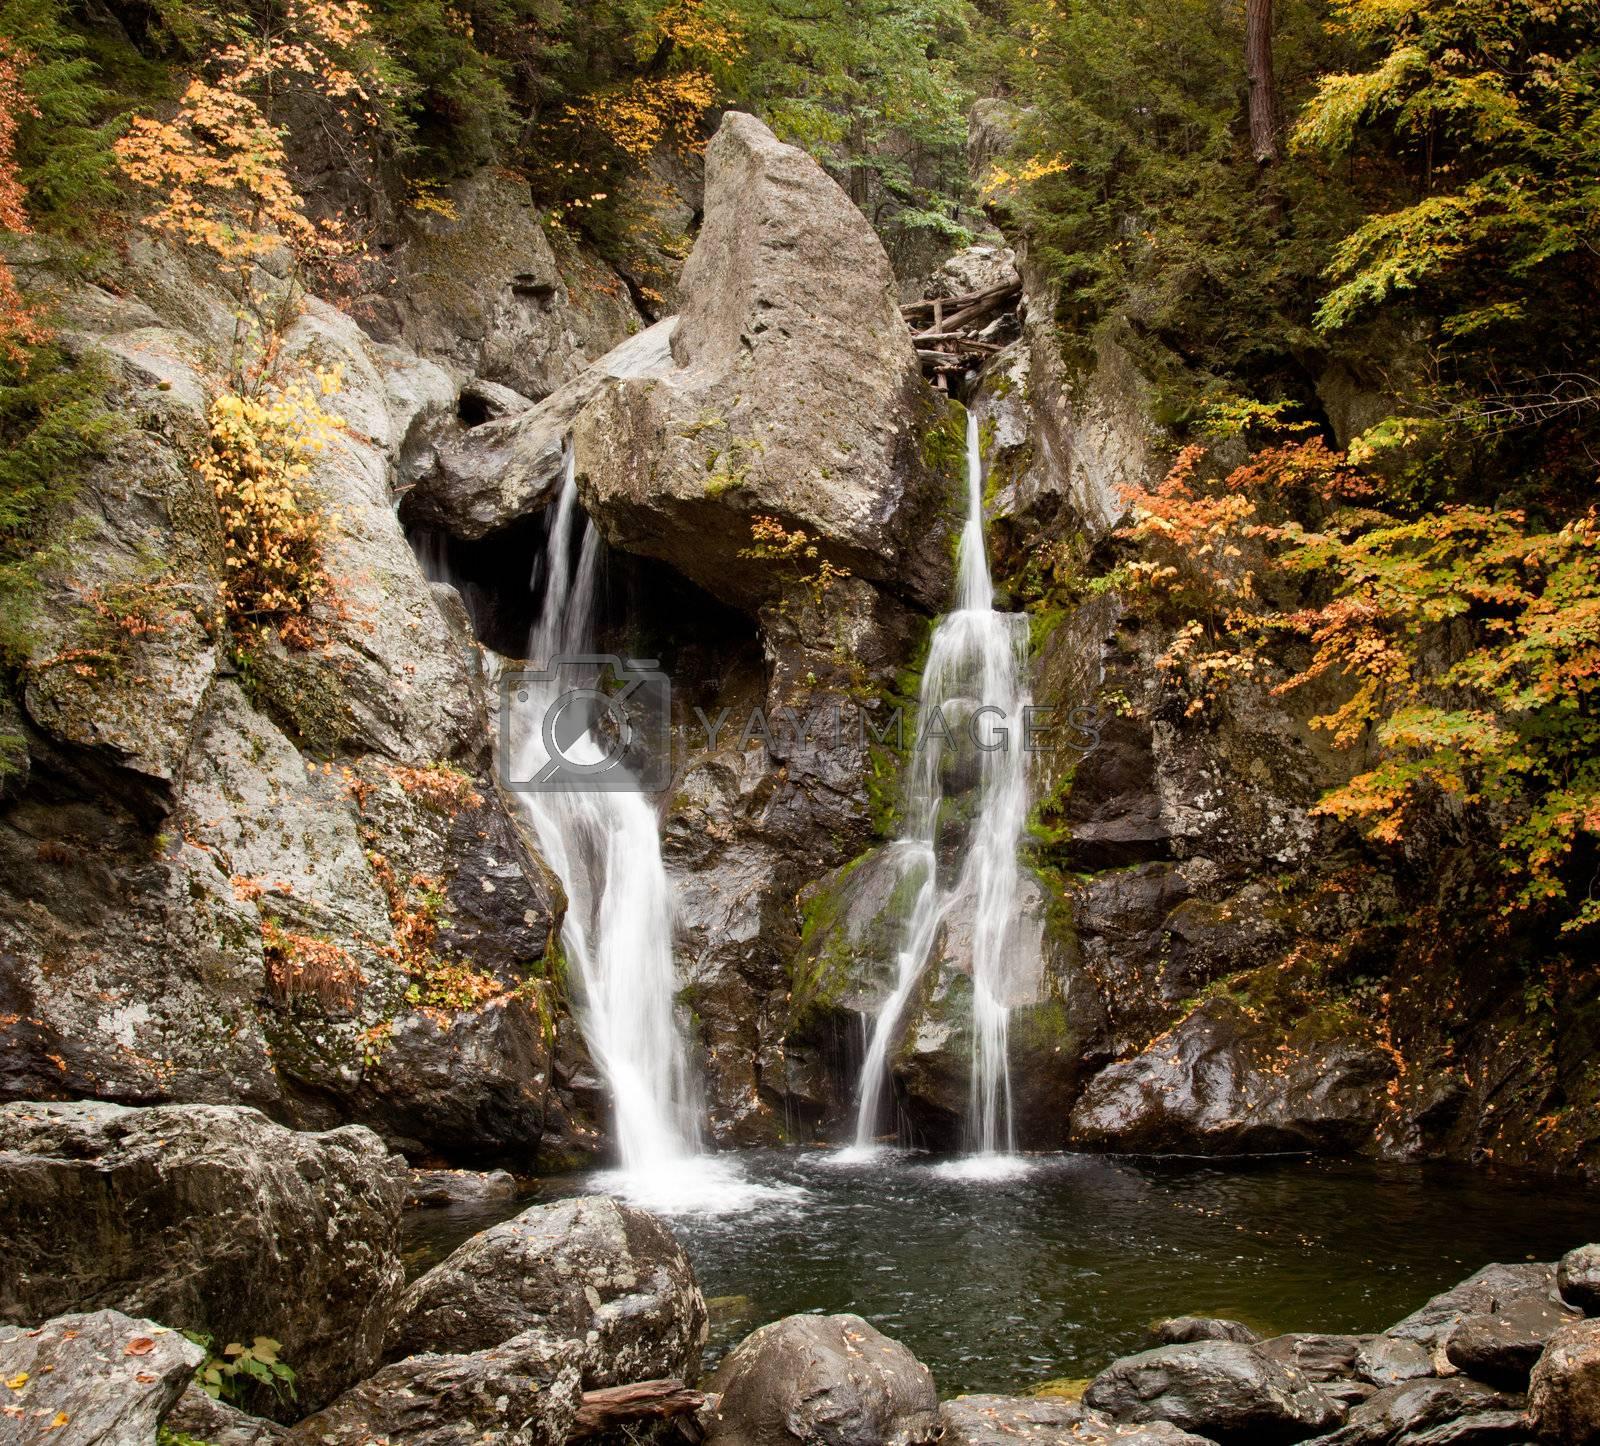 Royalty free image of Bash Bish falls in Berkshires by steheap